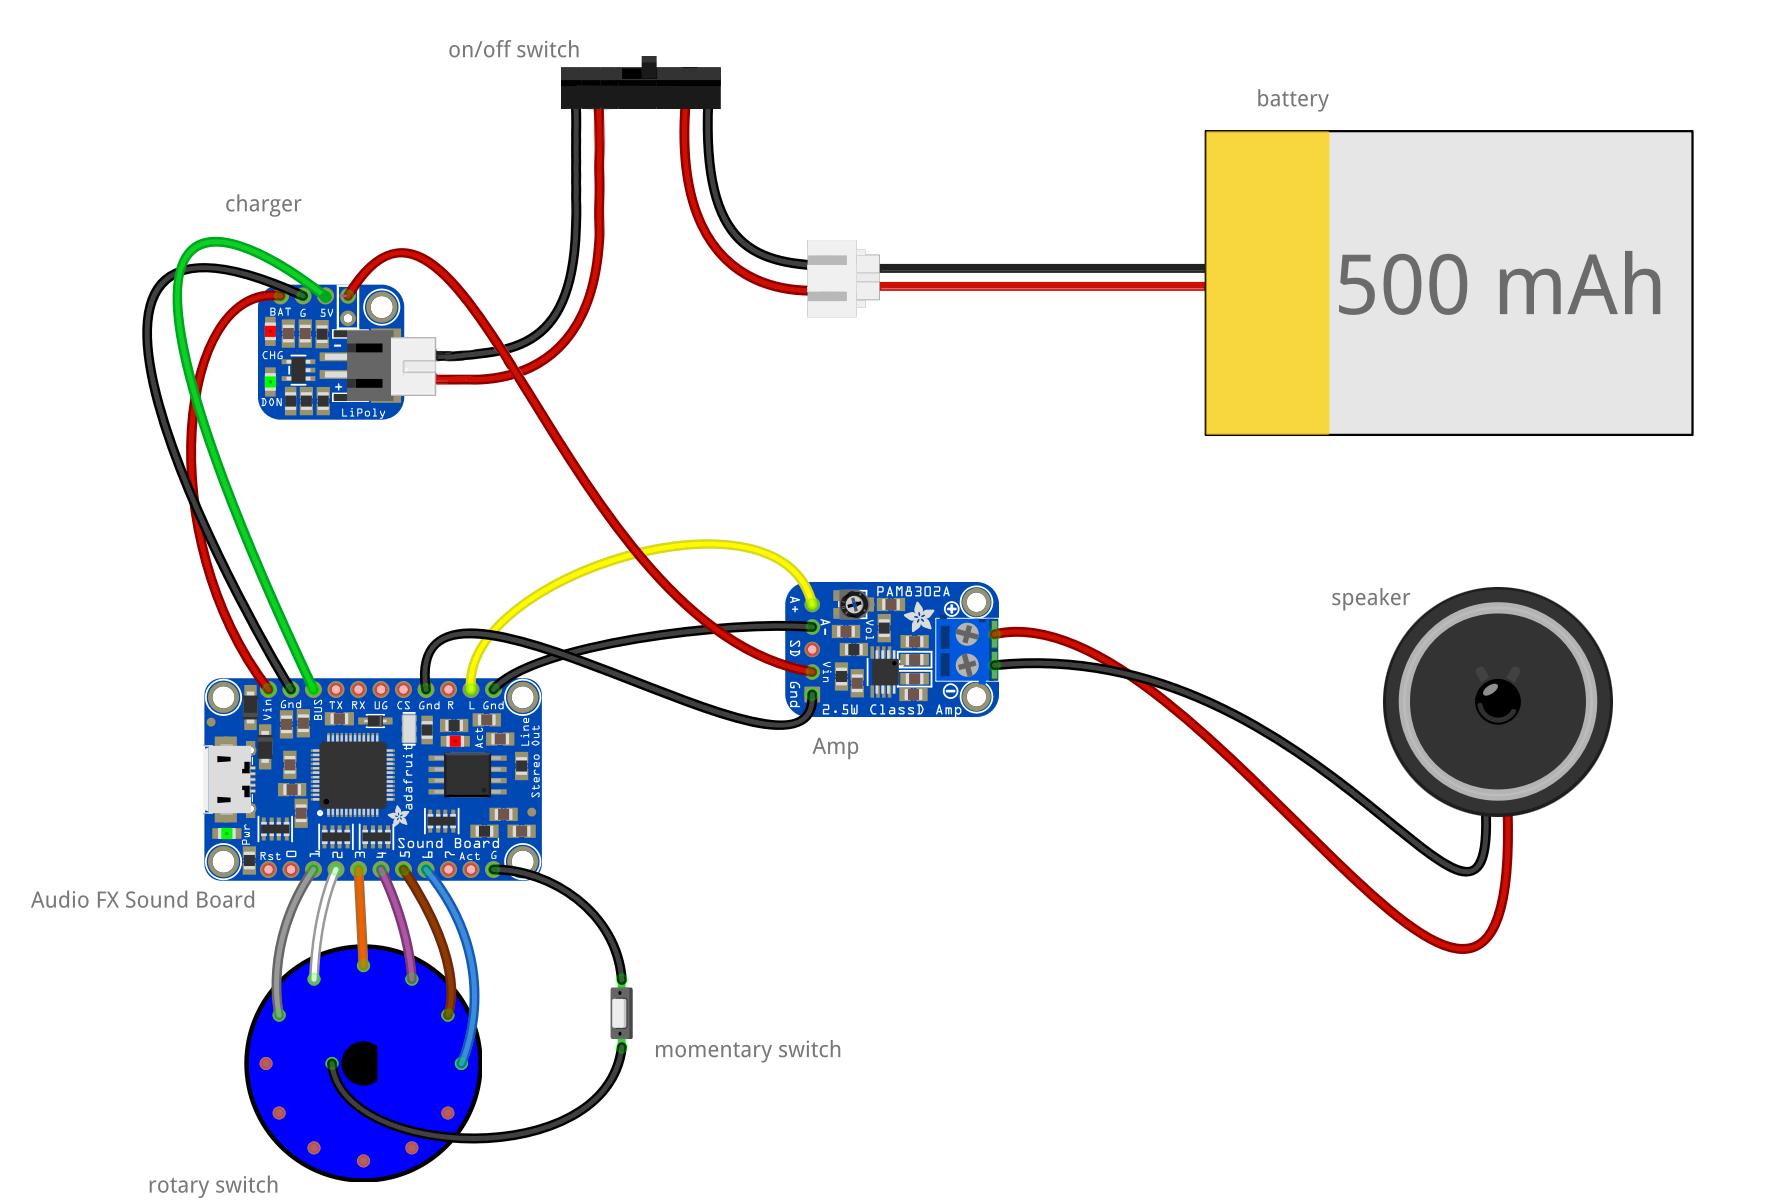 hacks_chewbaccaMask_circuit.png